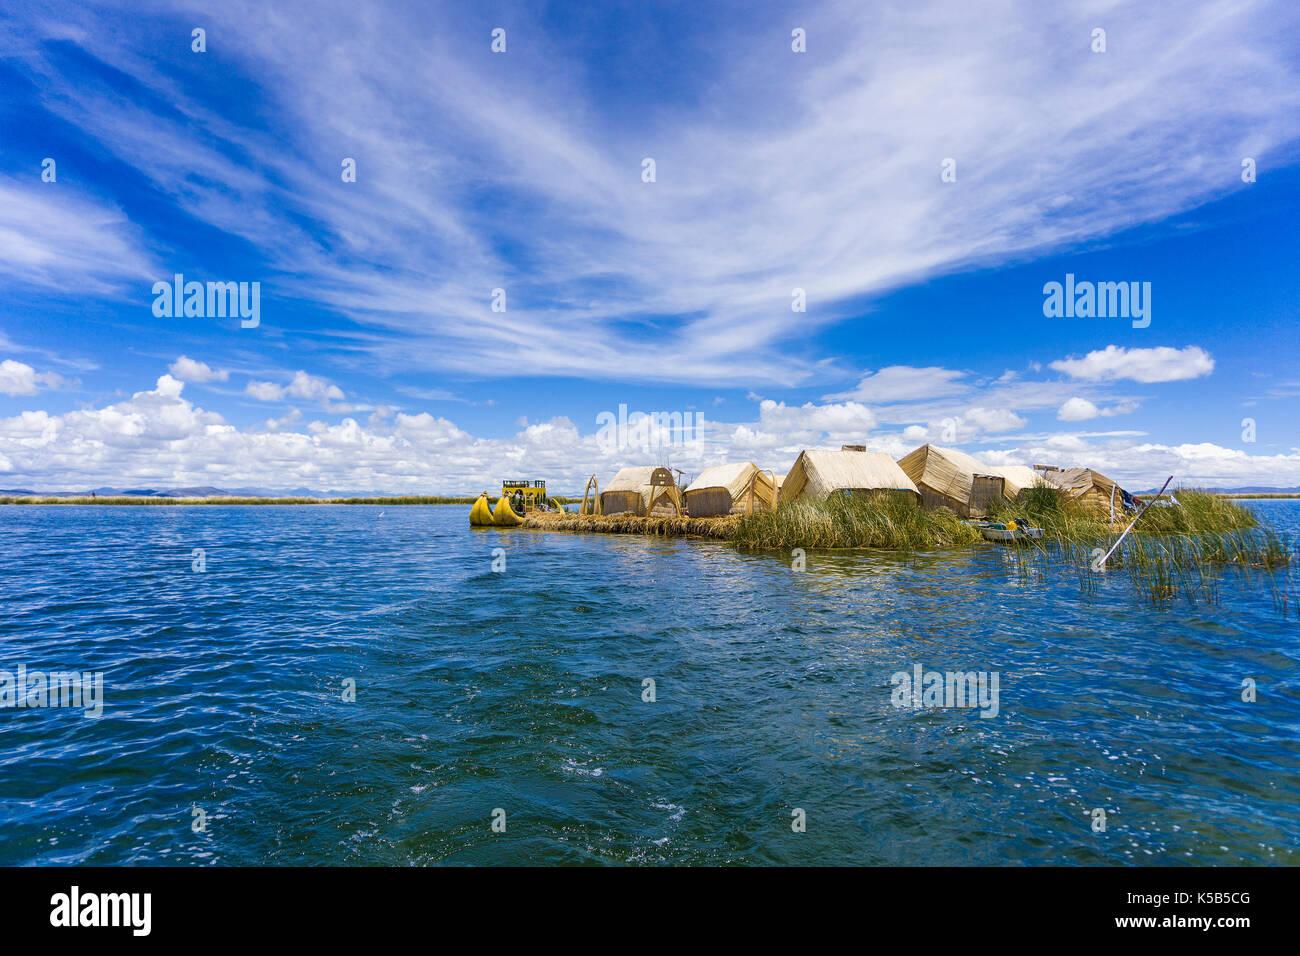 Totora boat on the Titicaca lake near Puno, Peru Stock Photo